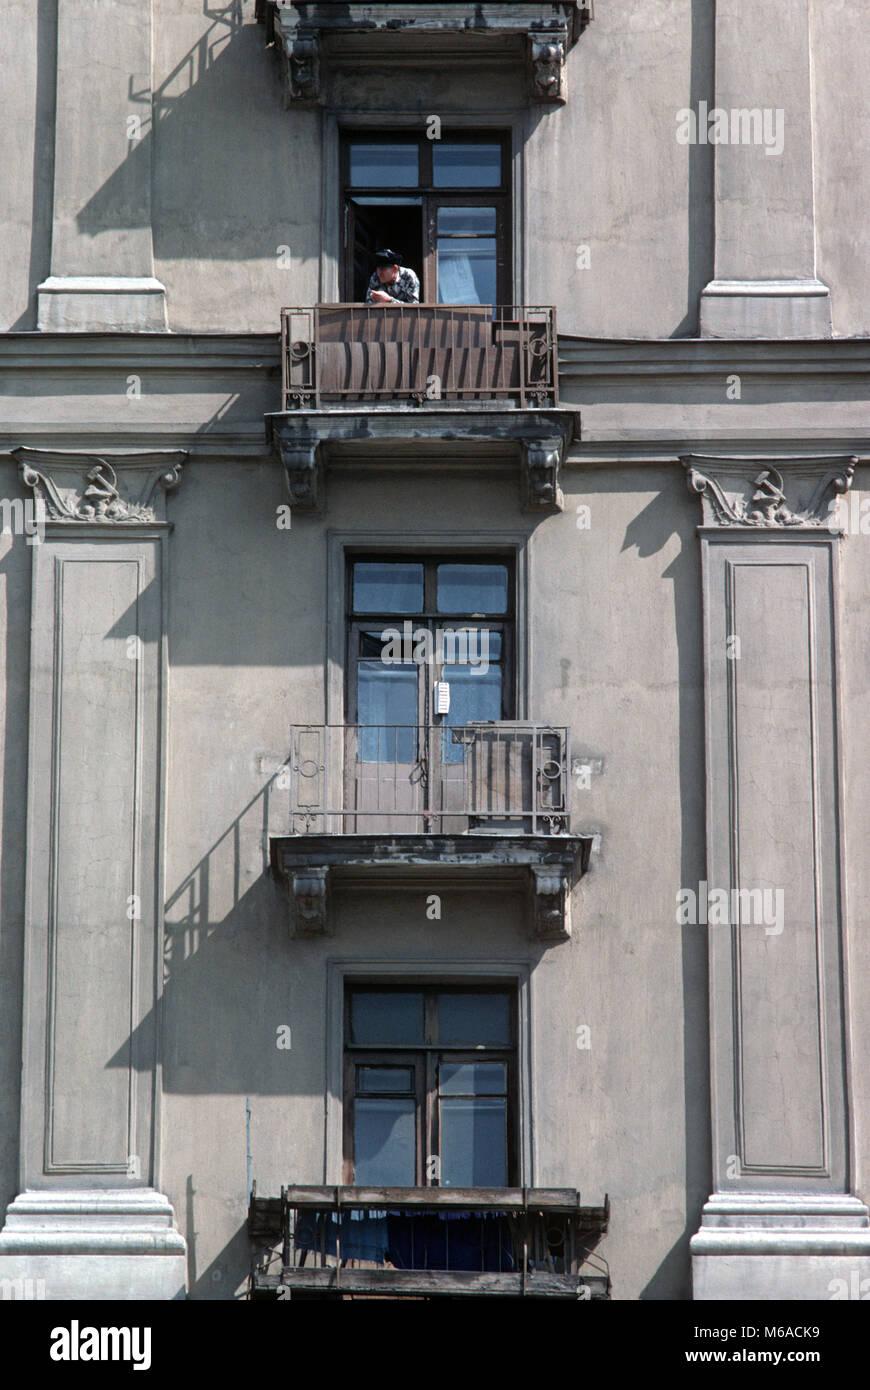 moscow apartment block balconies russia stock photo 176021085 alamy rh alamy com